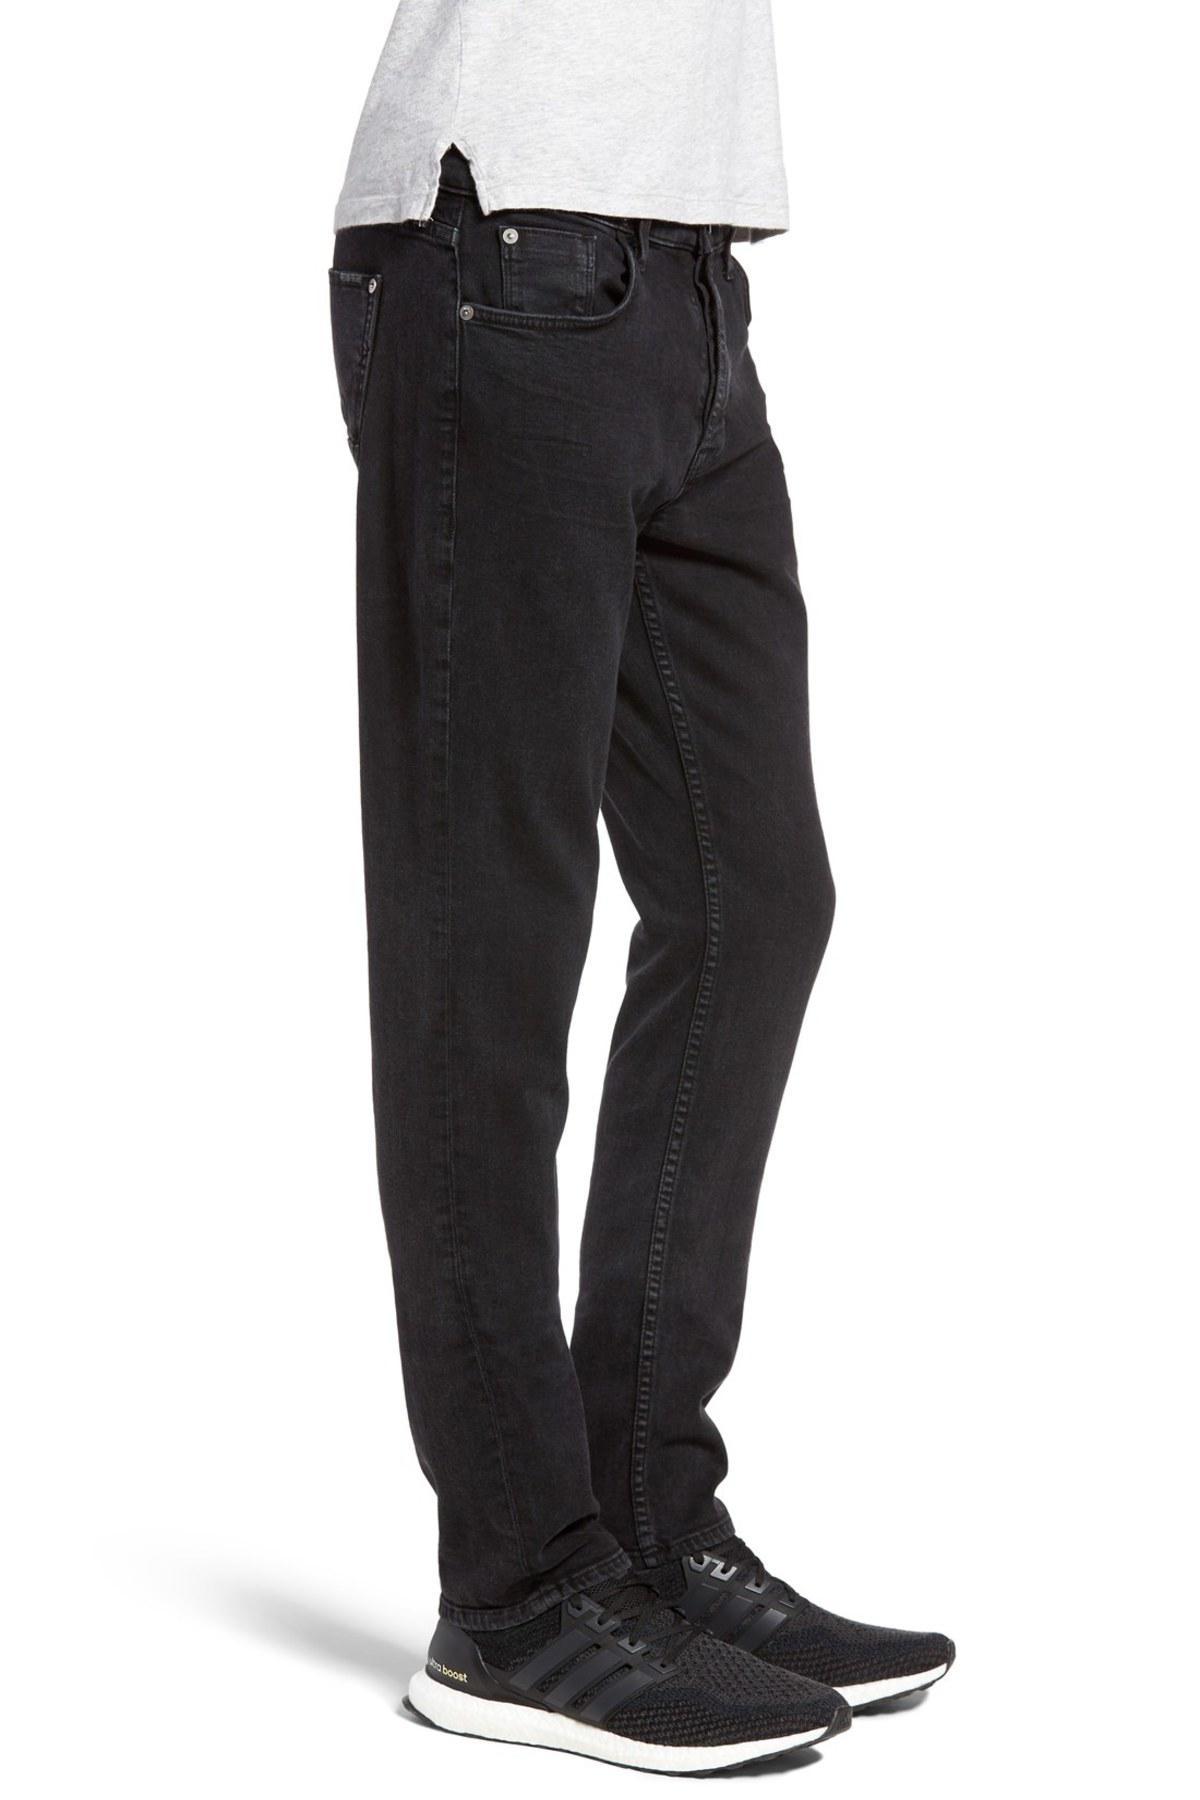 79fdaf0ad8b Hudson Jeans Sartor Slouchy Skinny Jean in Black for Men - Lyst